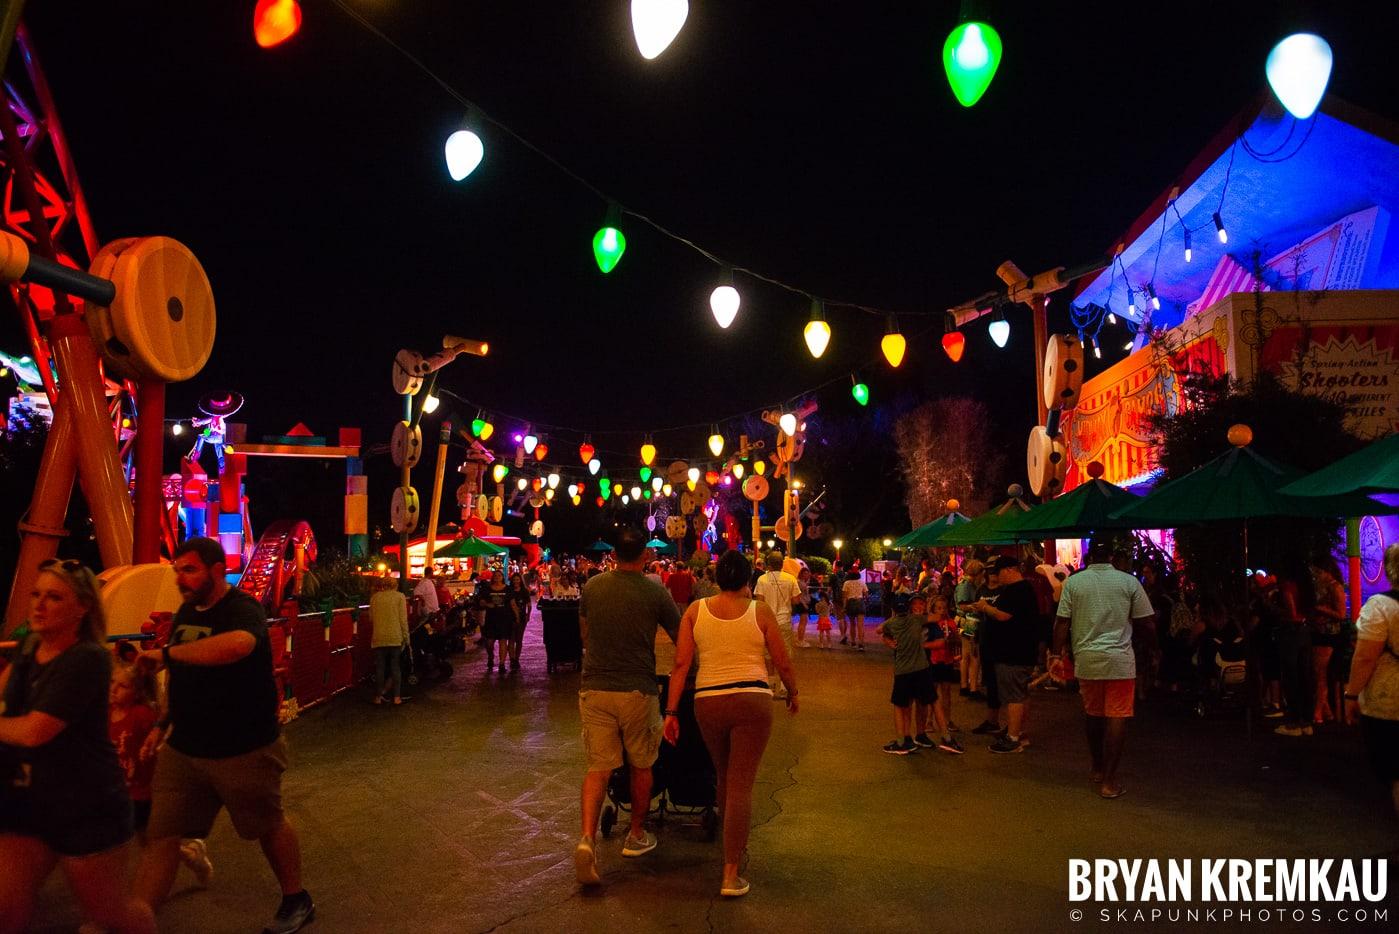 Walt Disney World Vacation: Day 5 (Animal Kingdom / Disney's Hollywood Studios) - 10.3.19 (42)